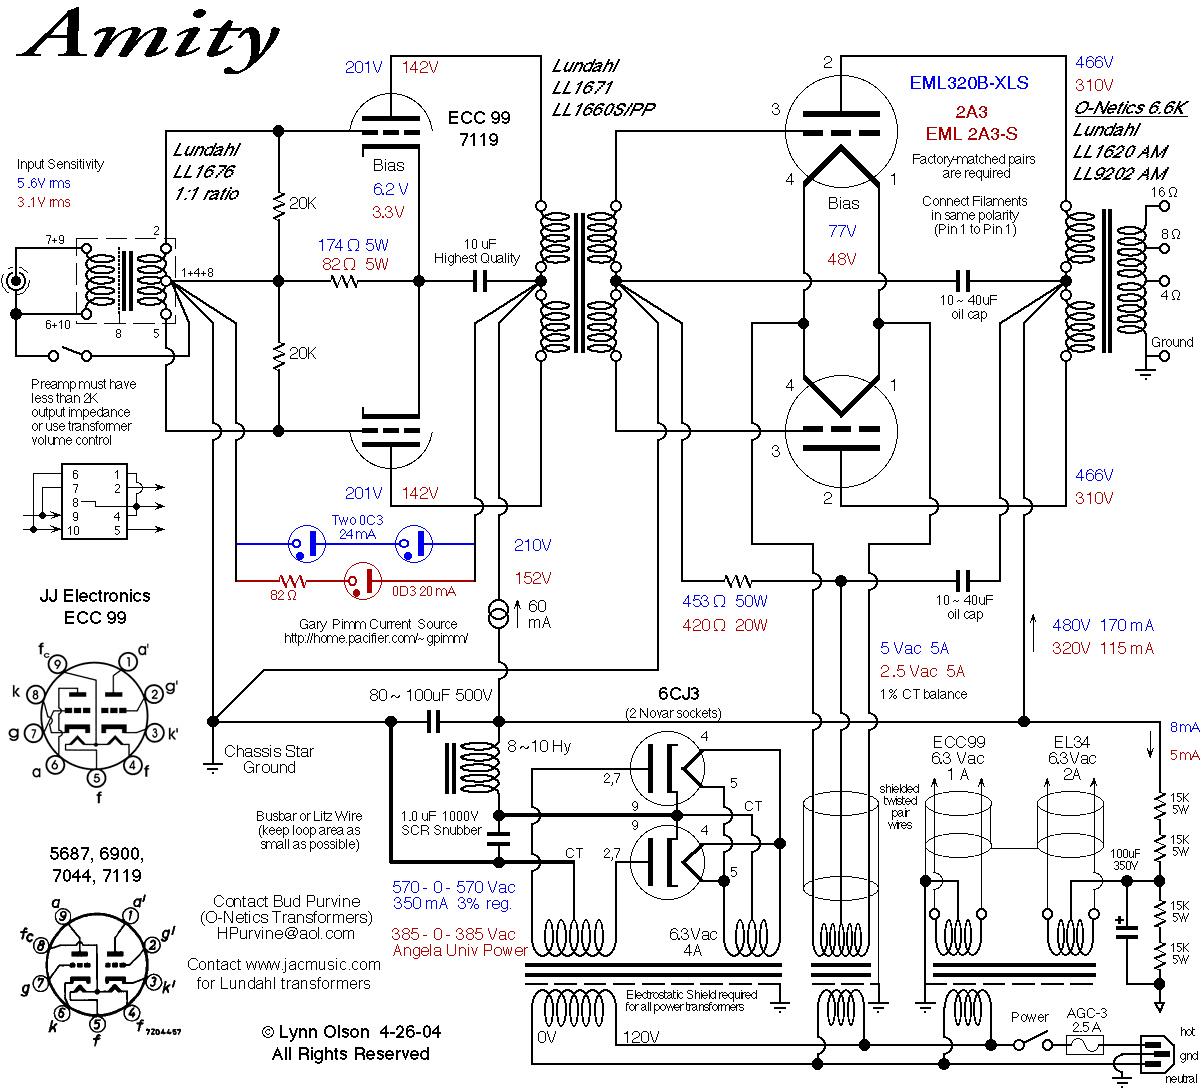 Index Of 2 Schematics Lundahl Transformers Se Amplifiers